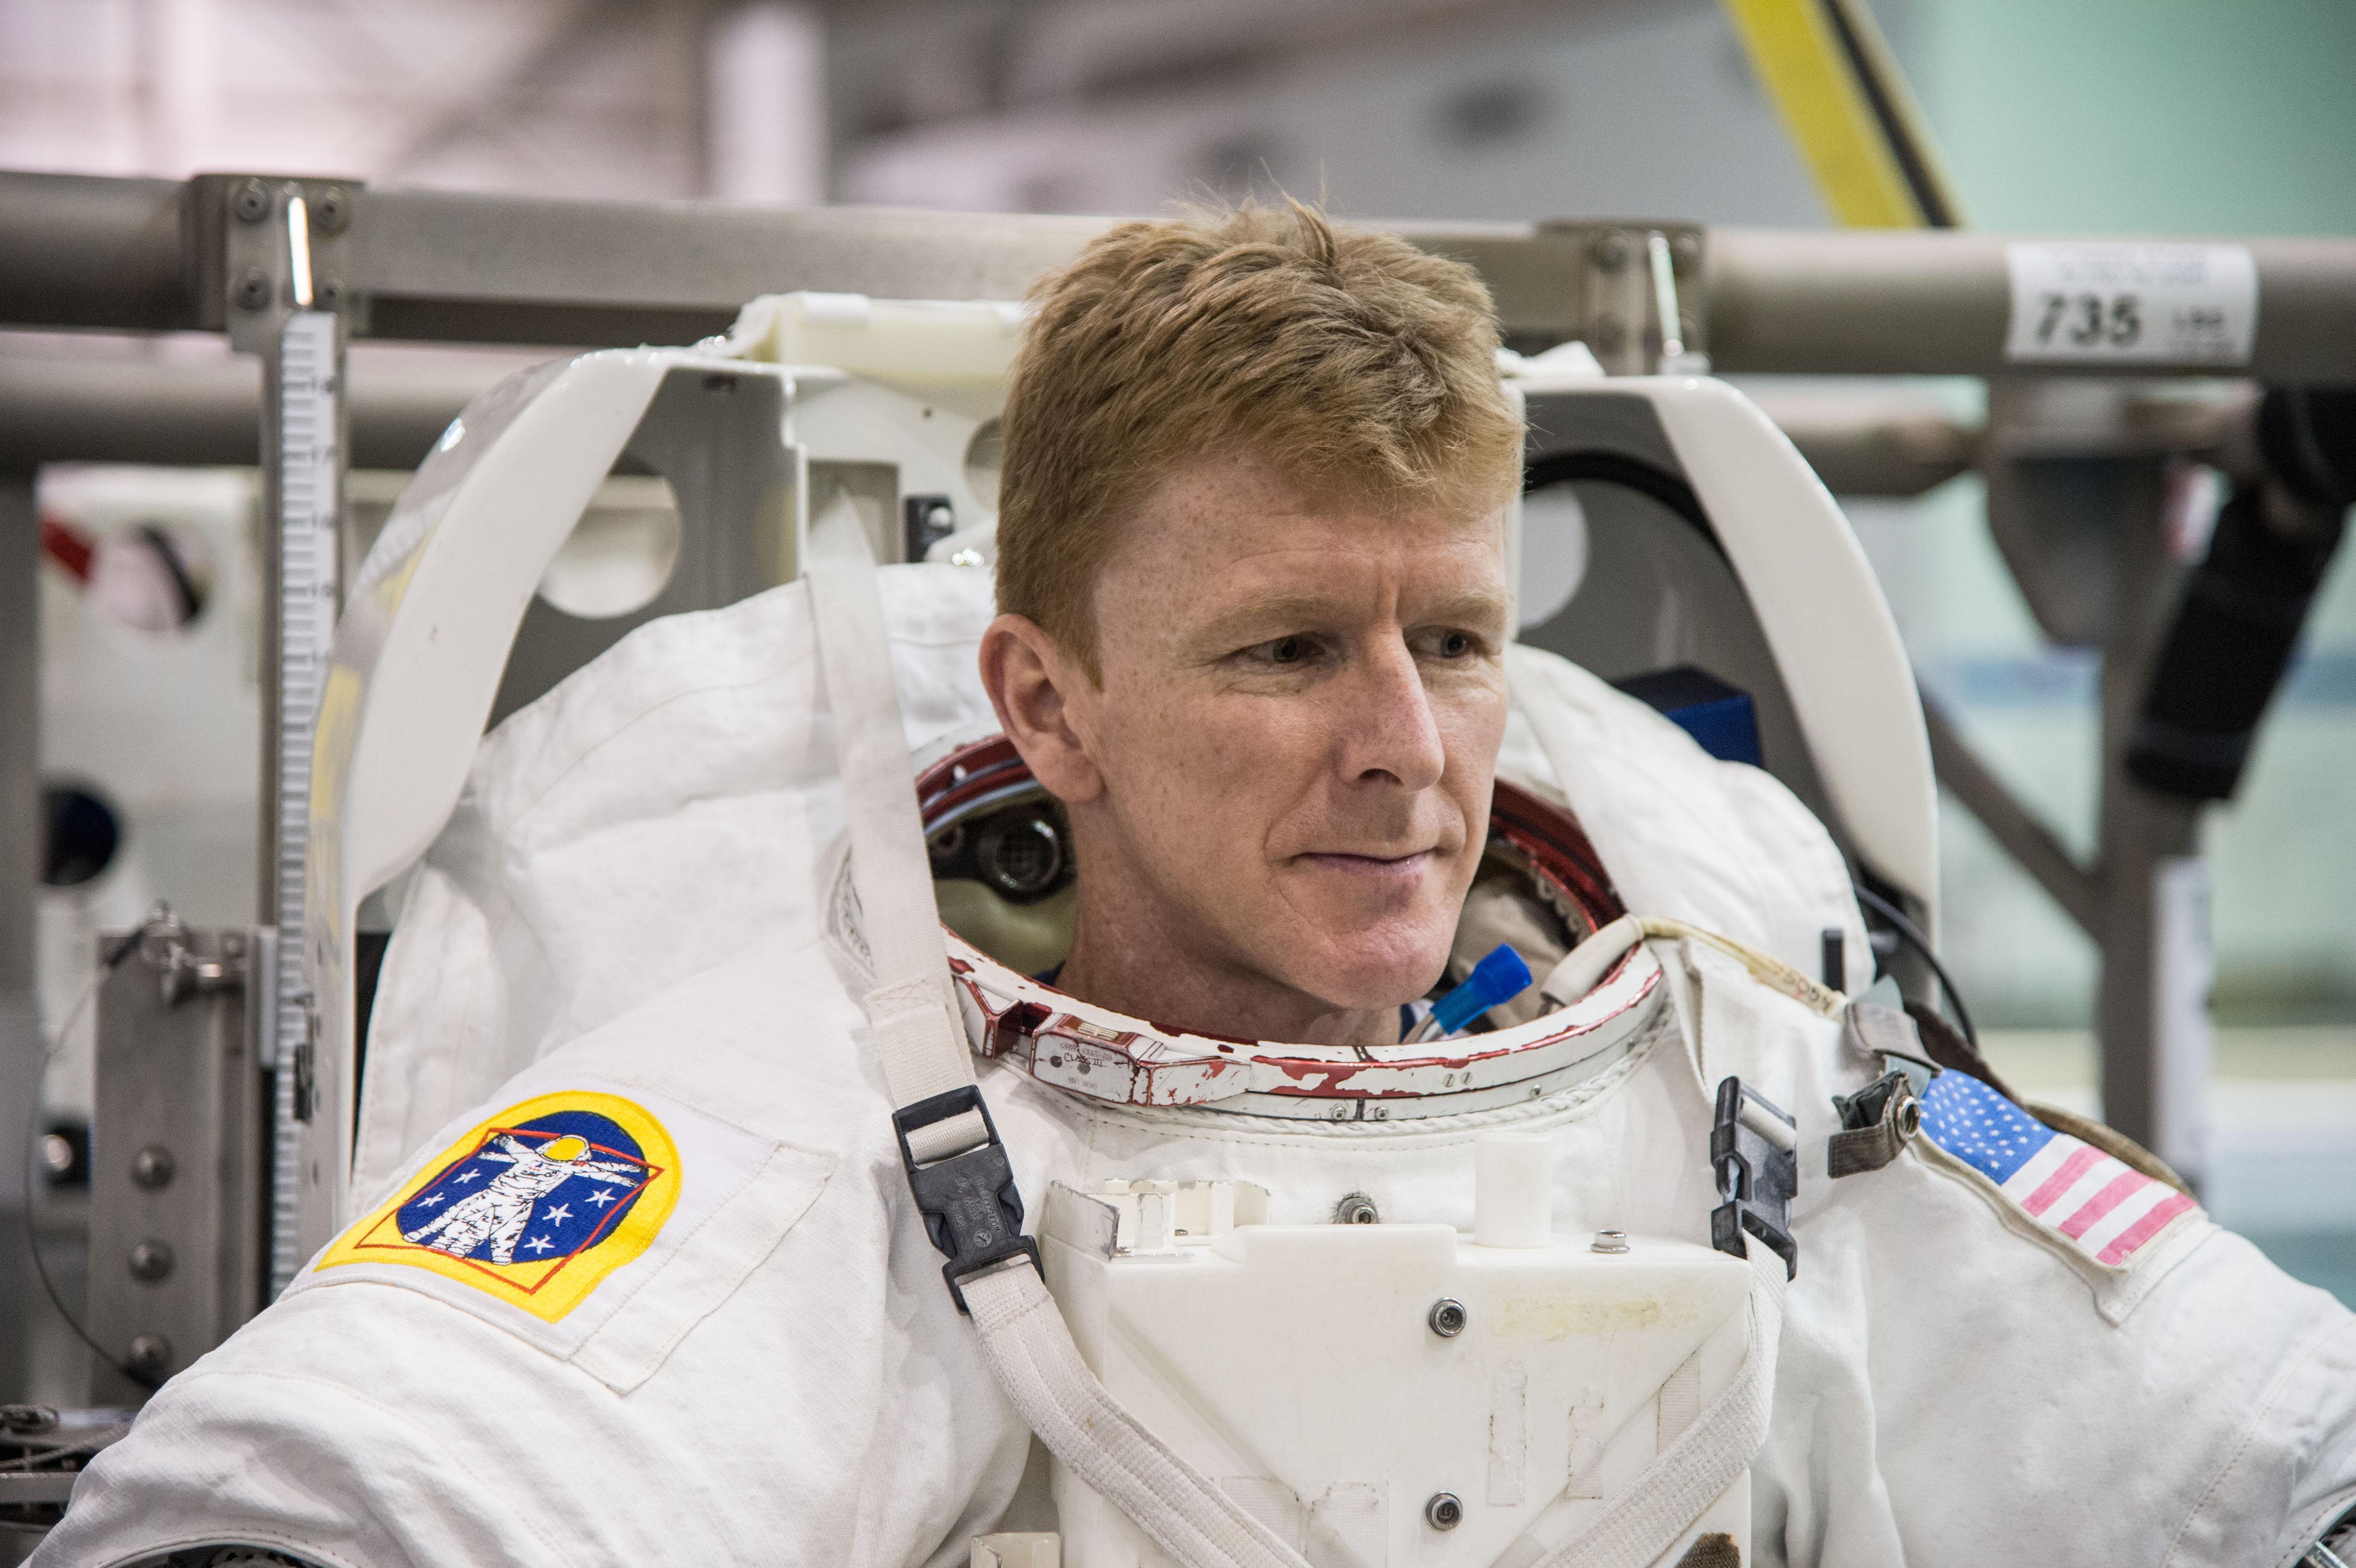 european space agency astronaut jobs - photo #7